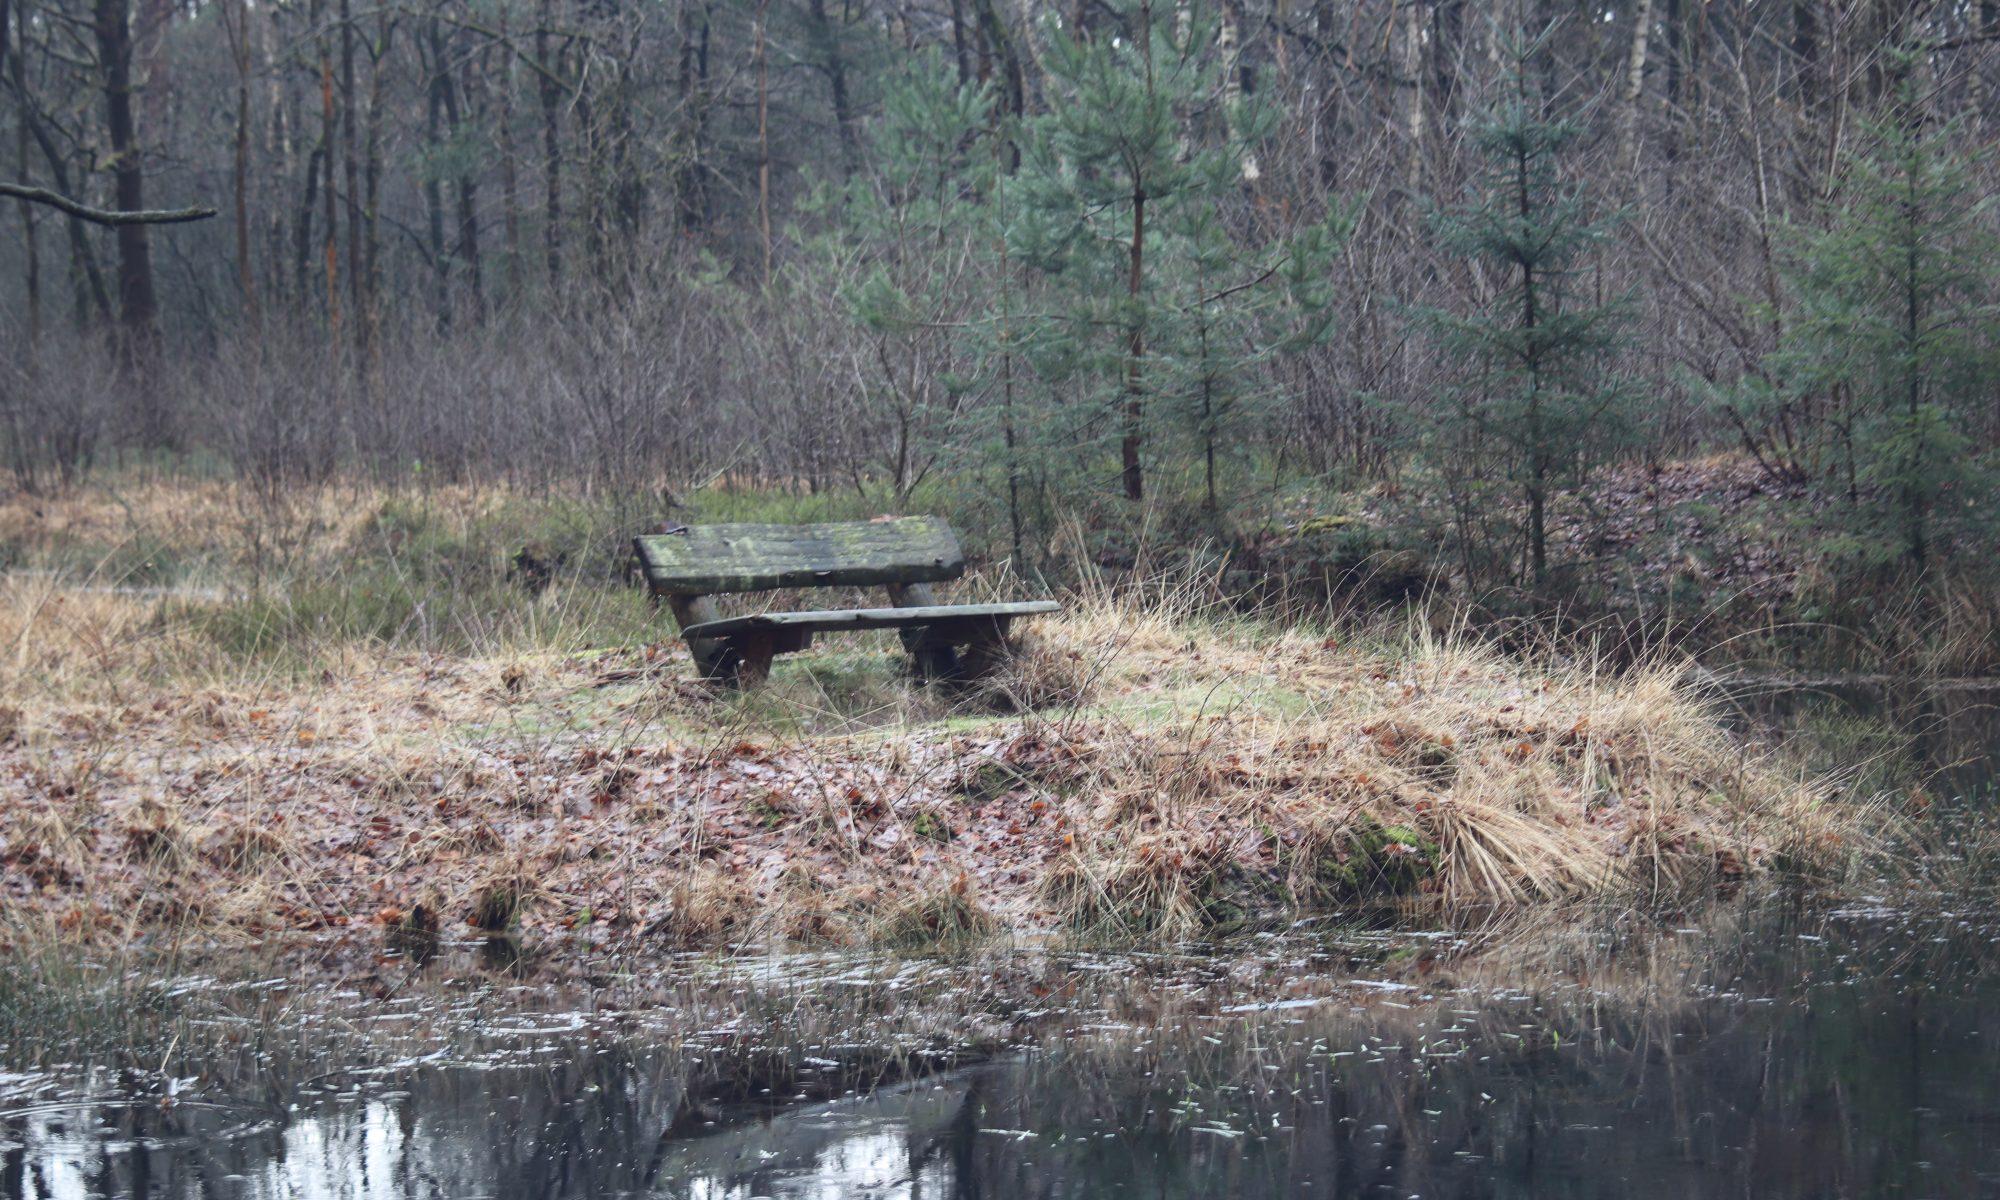 Dartheide - Bench